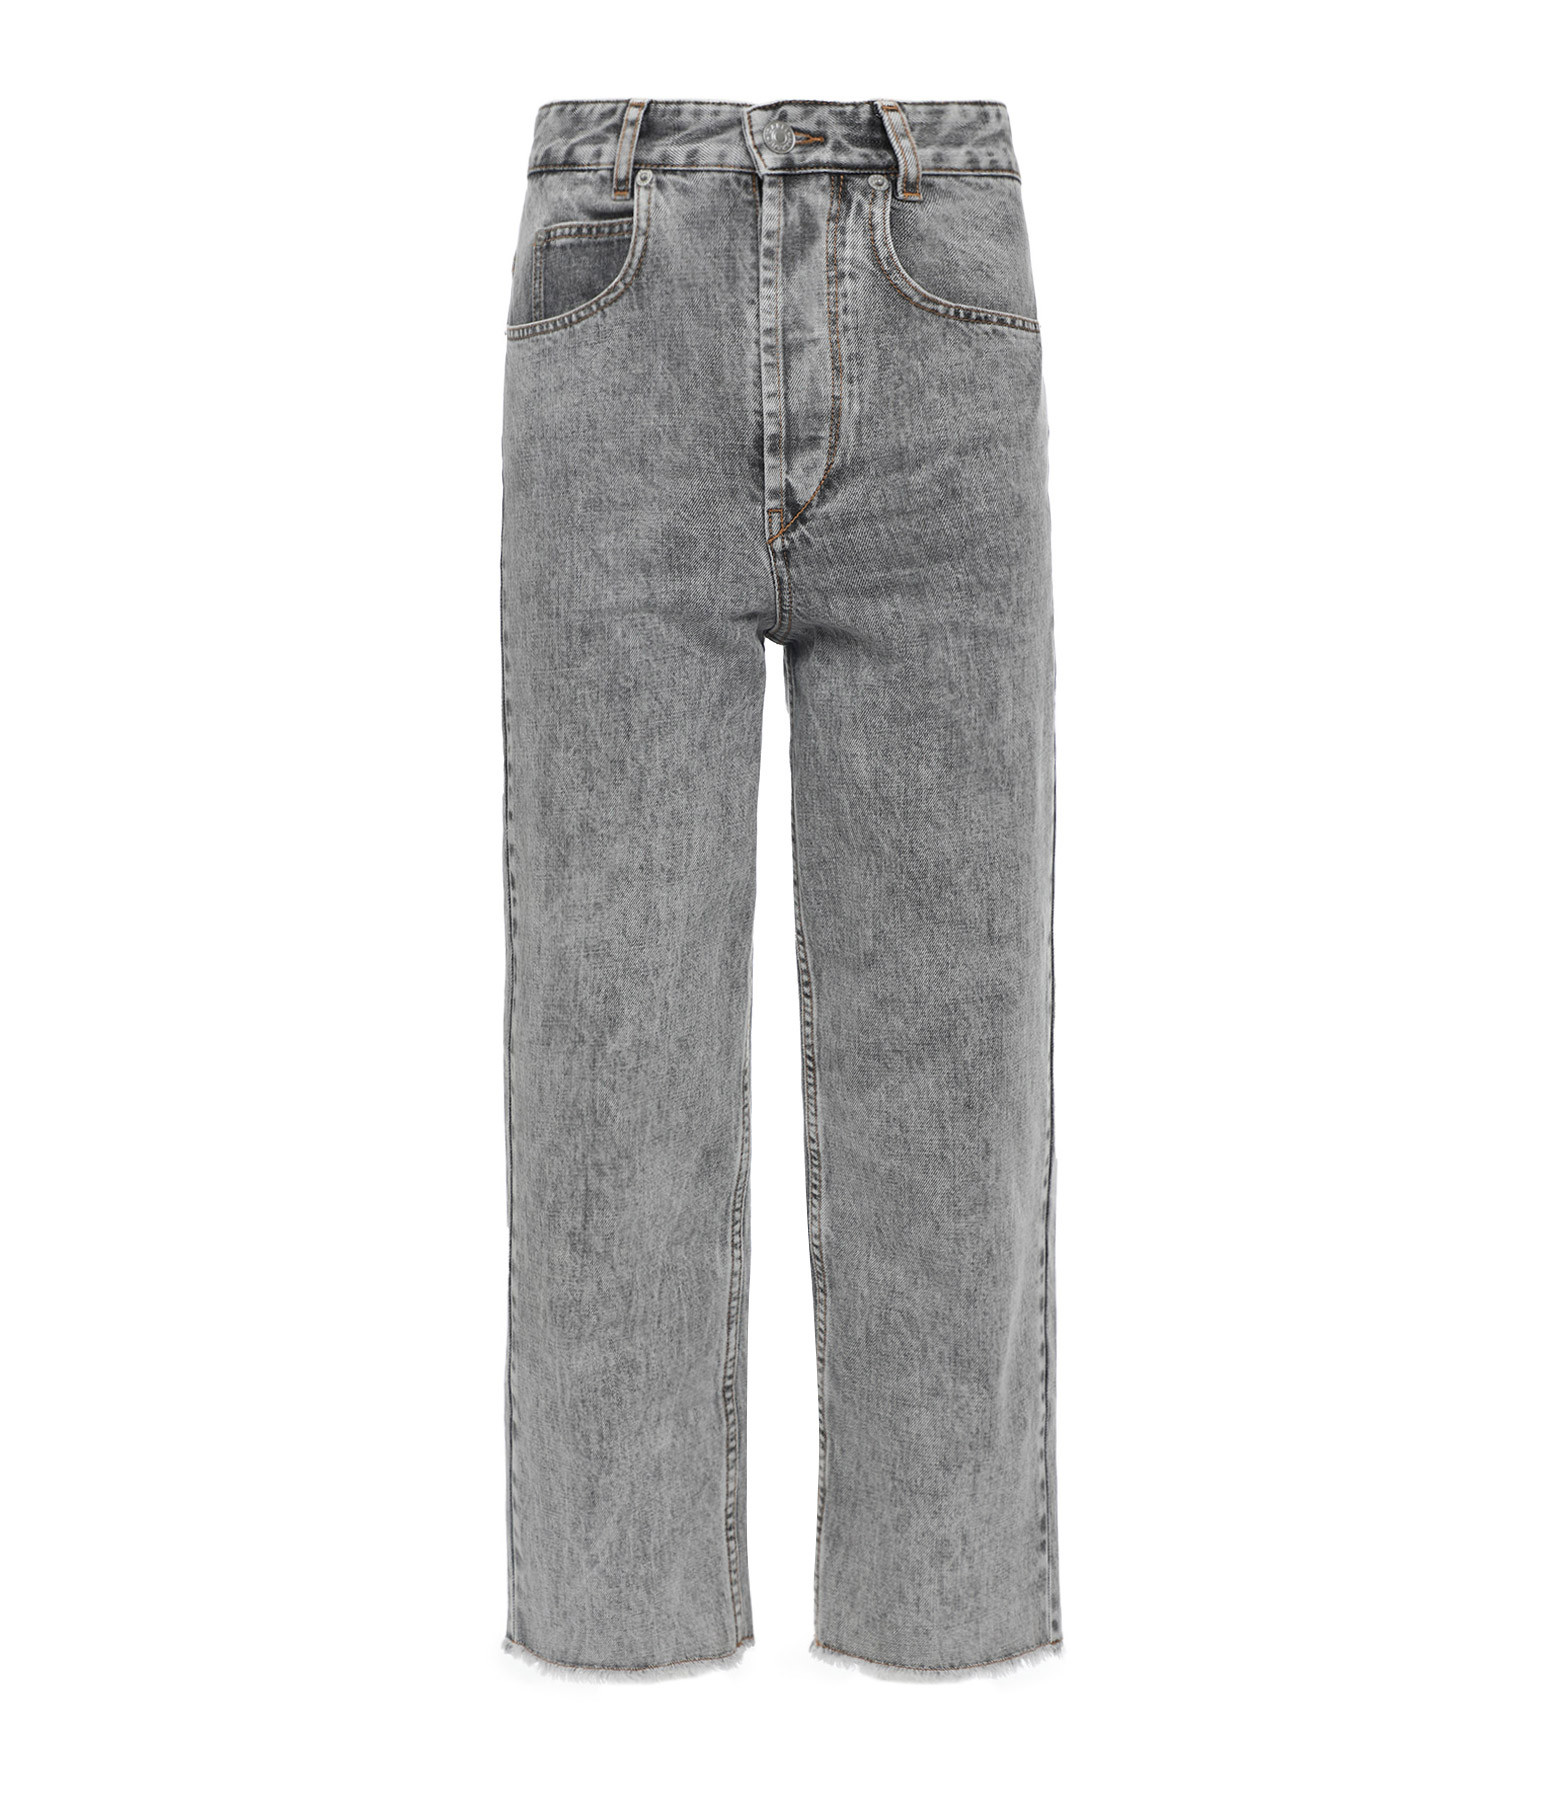 ISABEL MARANT ÉTOILE - Pantalon Laliskasr Coton Gris